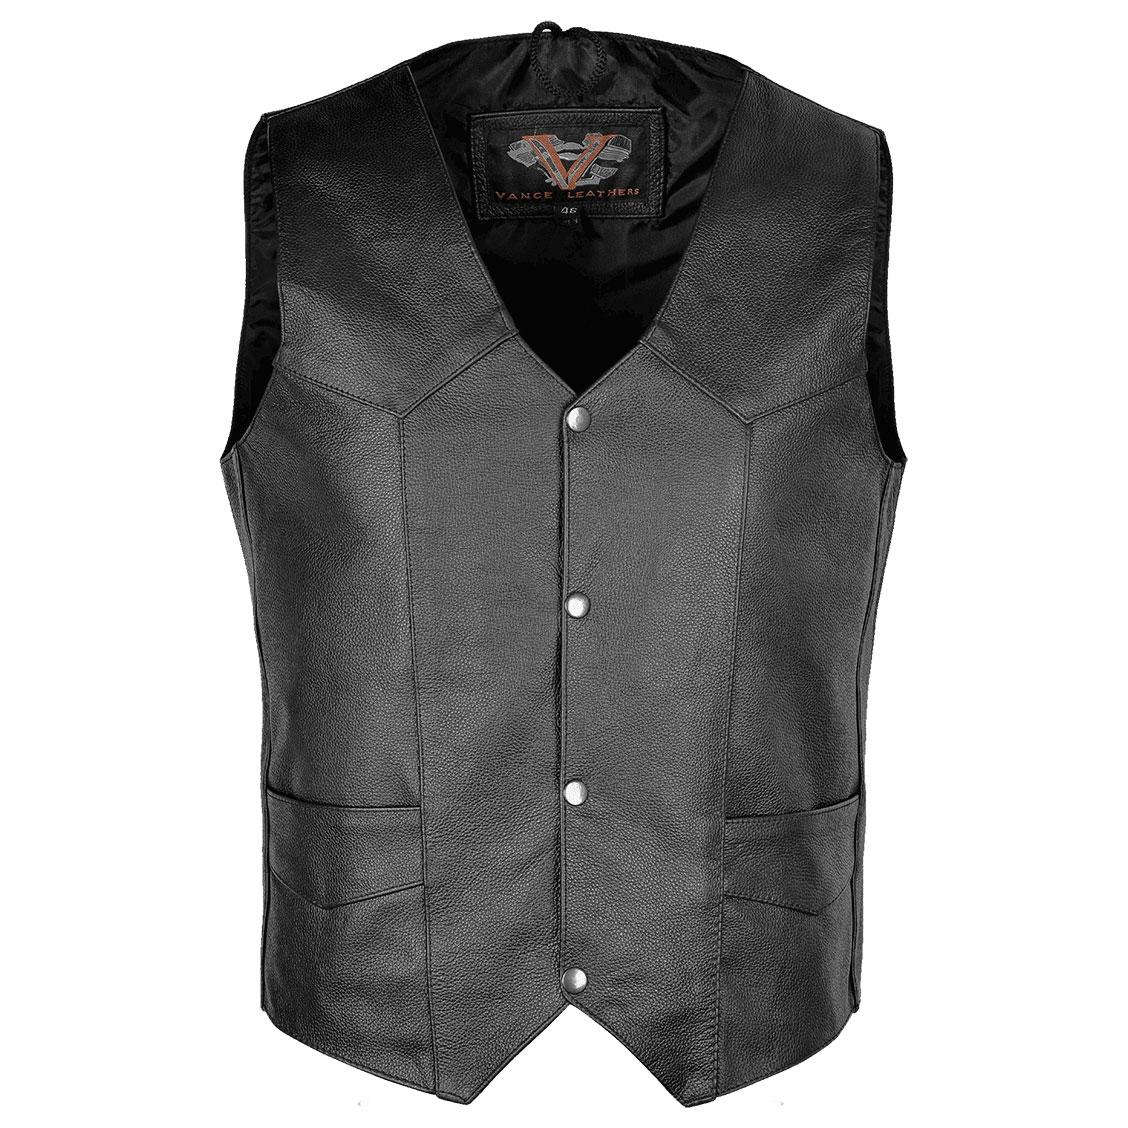 Vance Leathers Men's Plain Side Black Leather Vest